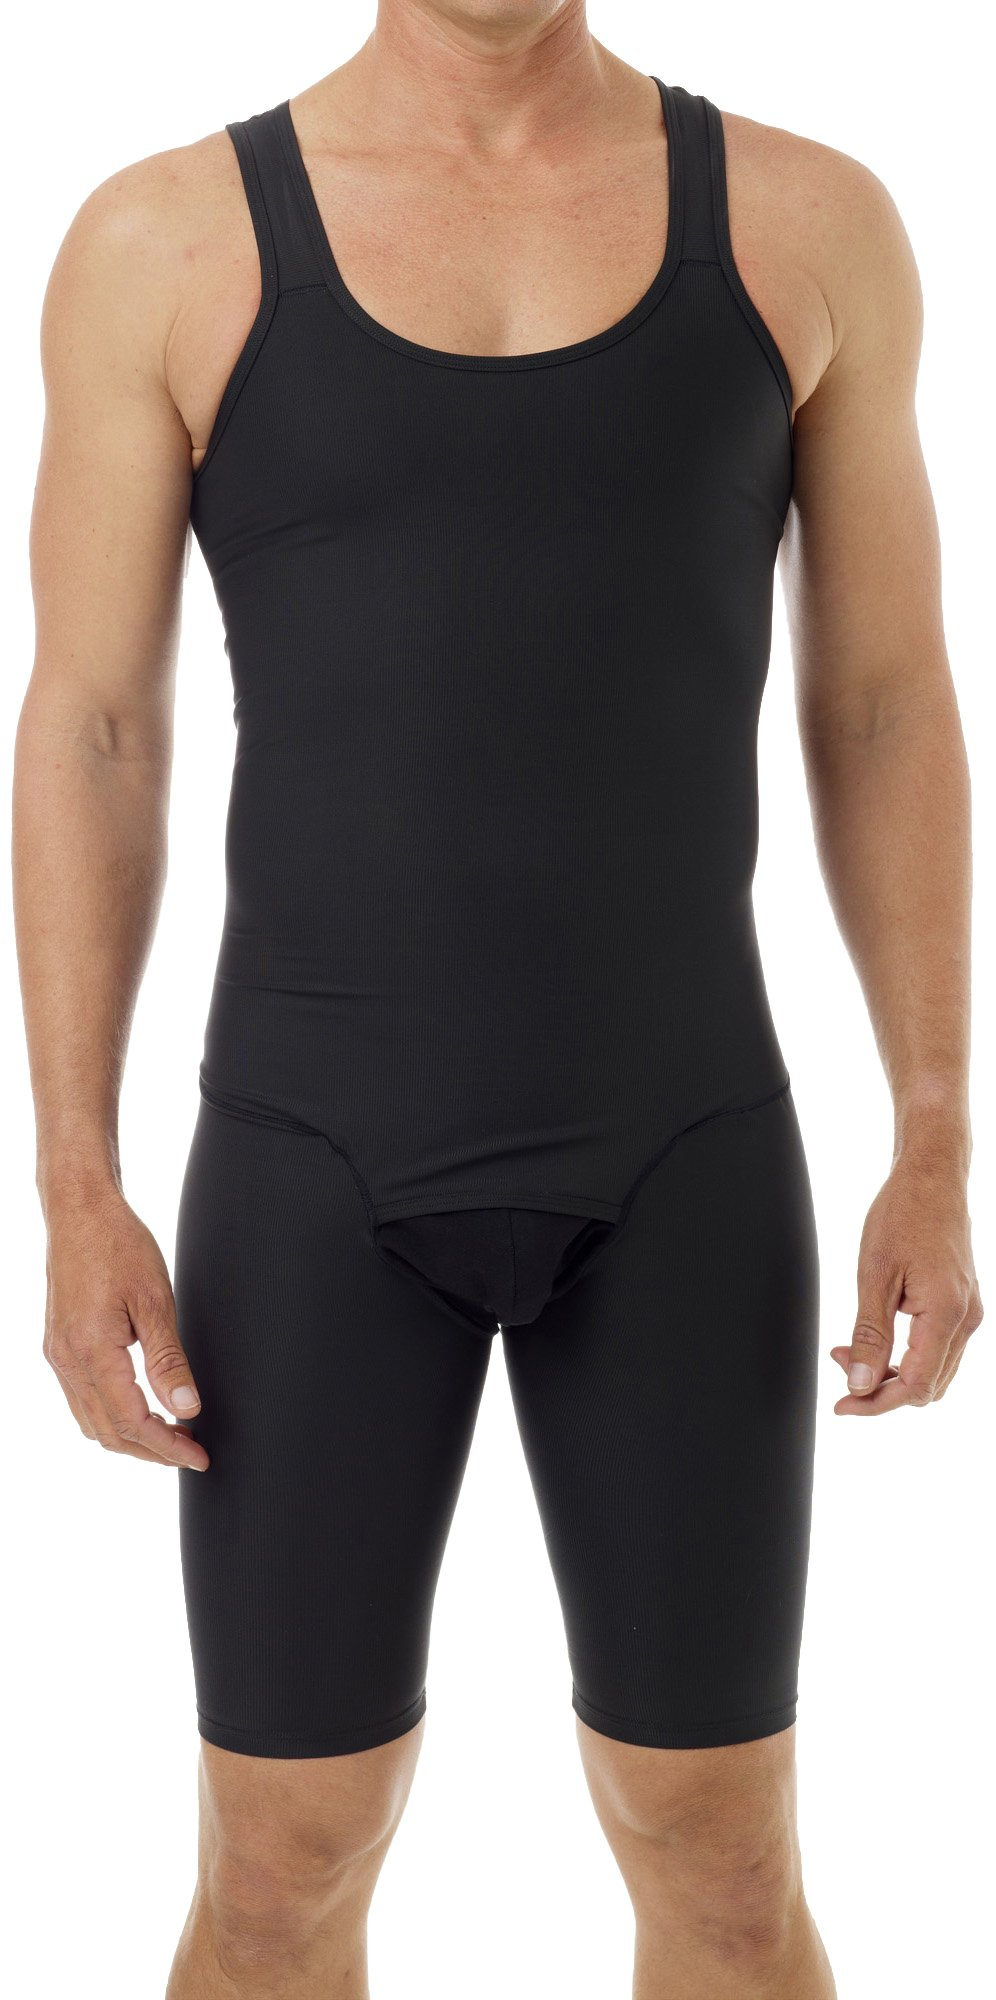 Underworks Mens Compression Bodysuit Girdle Shirt Large Black by Underworks